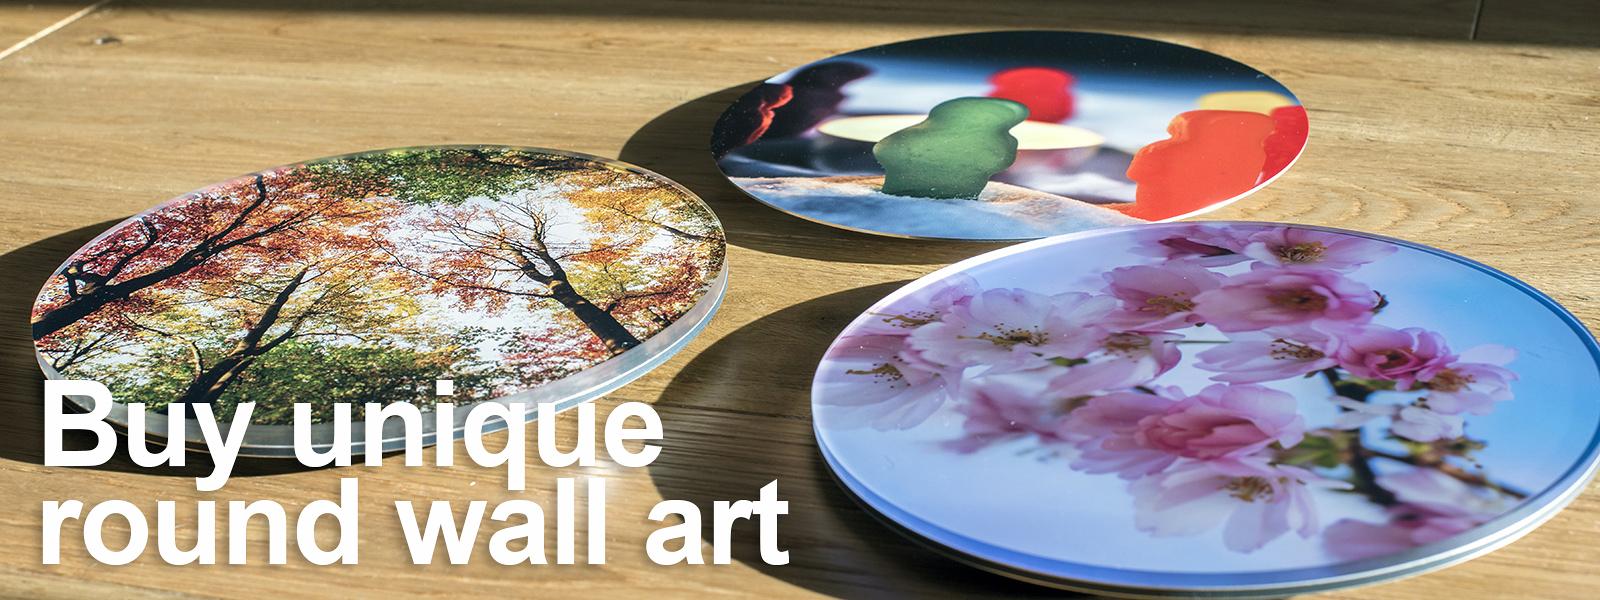 Buy unique round wall art